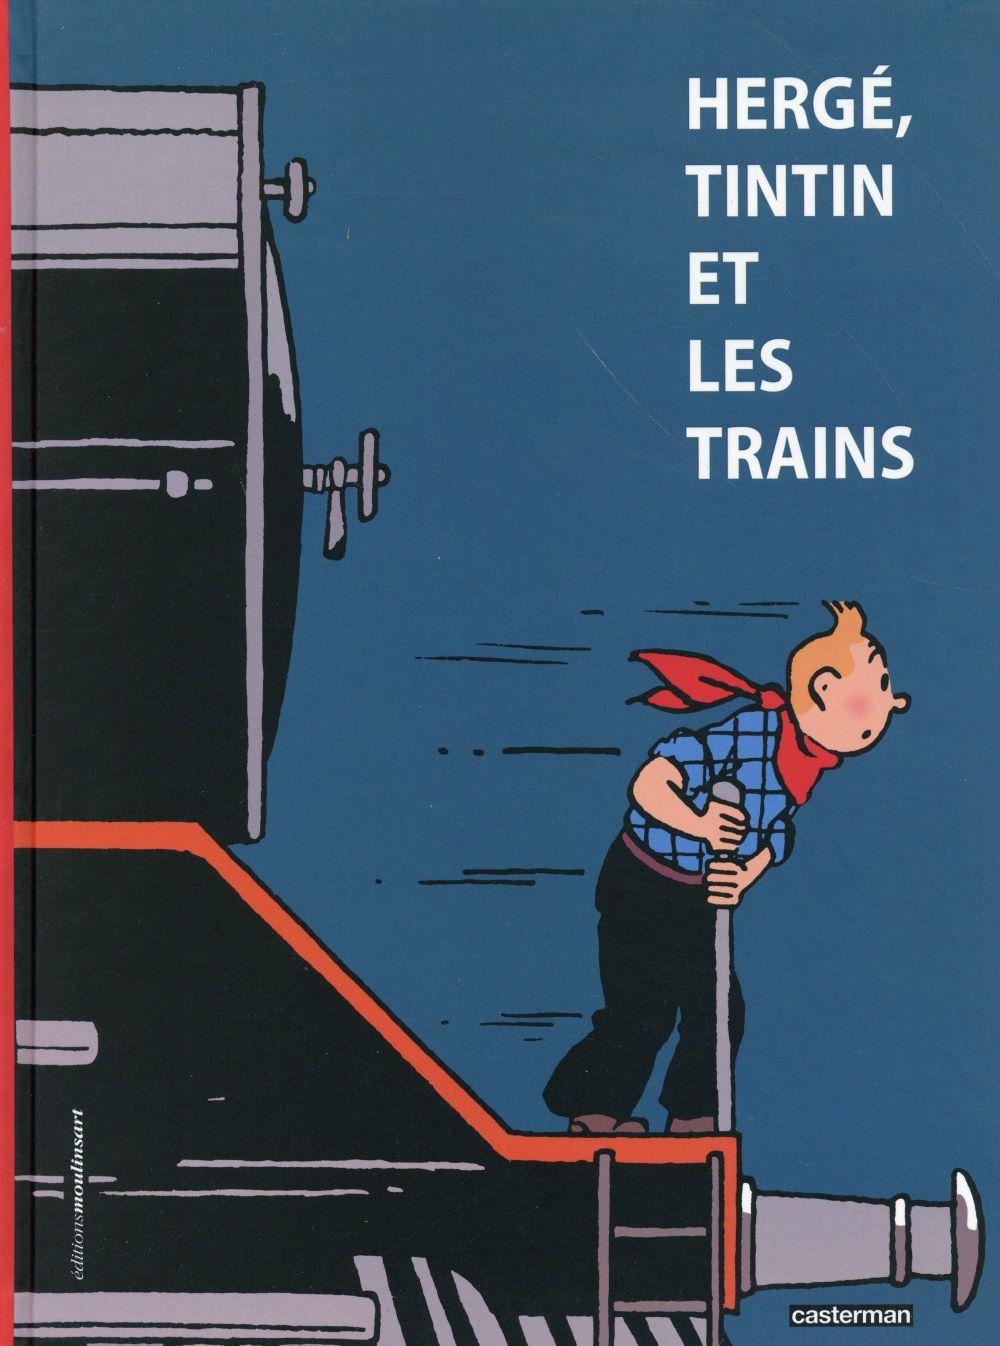 HERGE, TINTIN ET LES TRAINS Verley Benoit